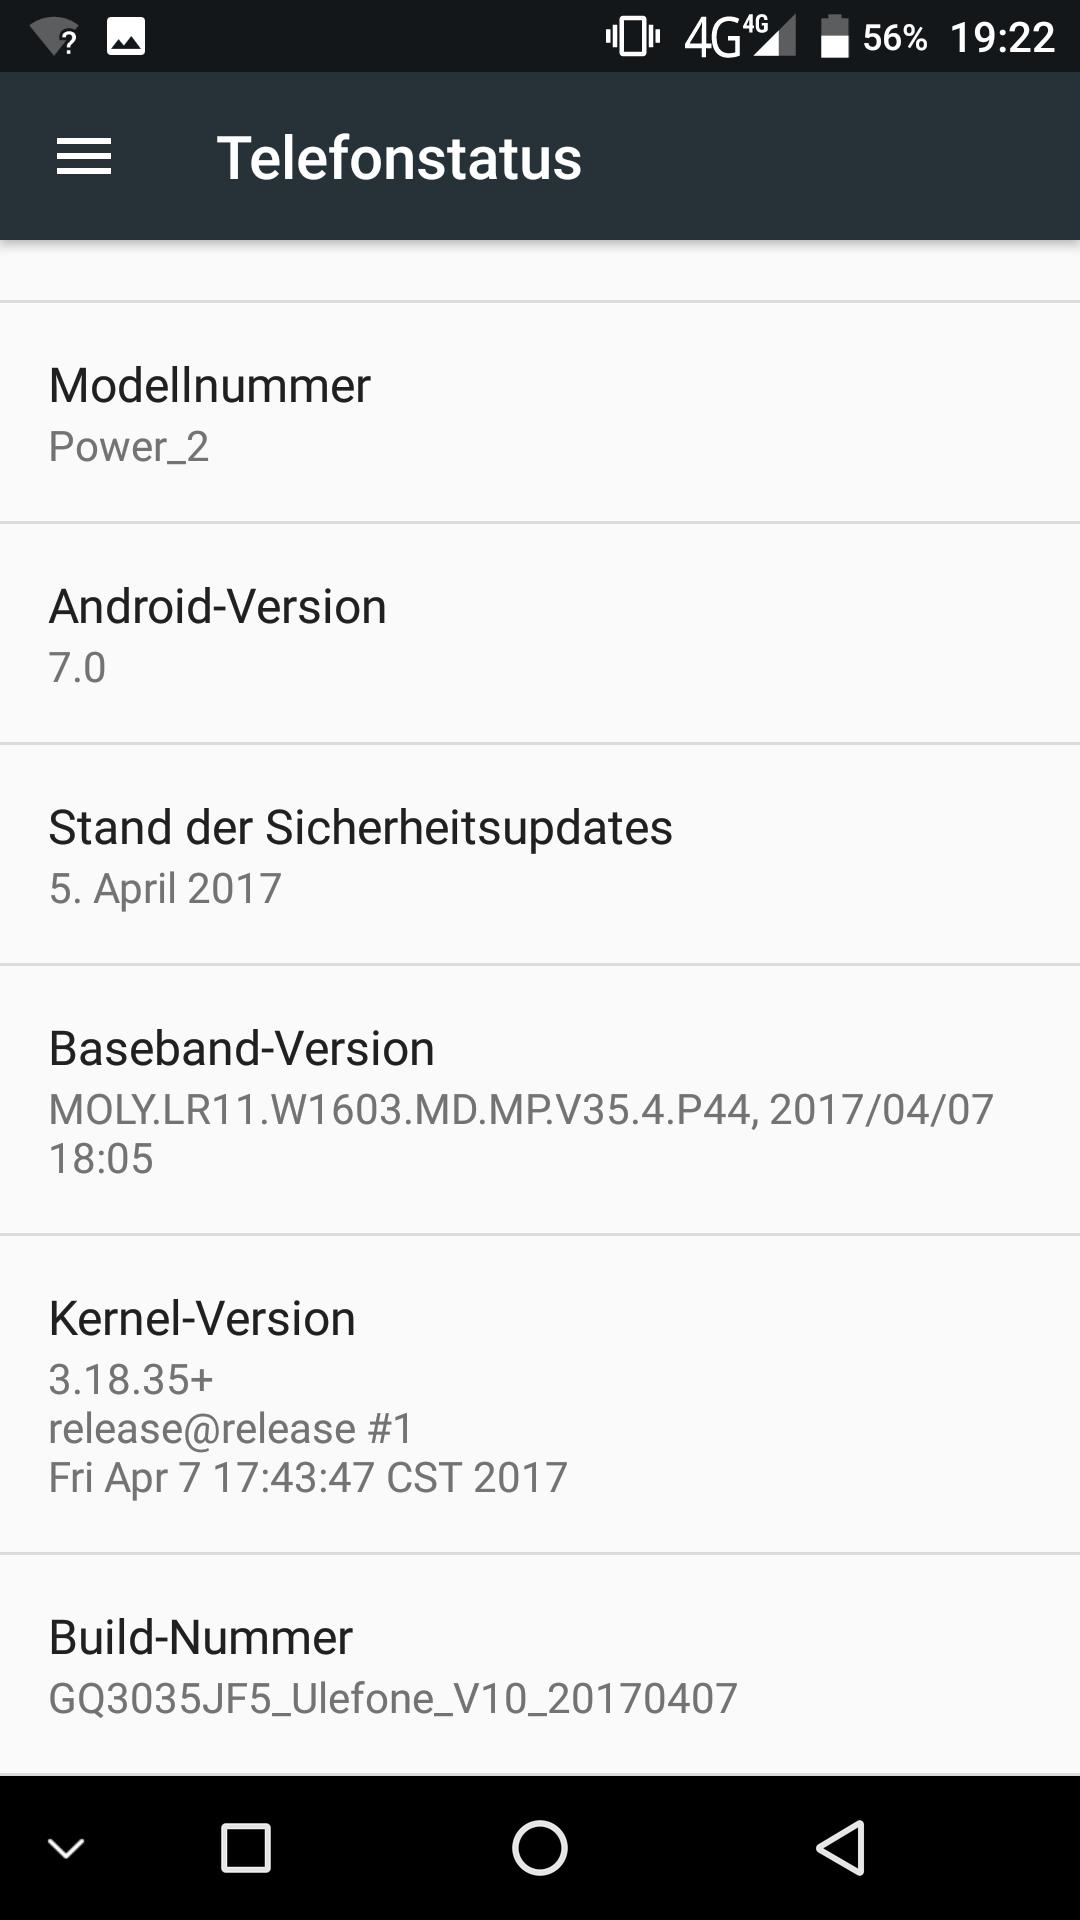 UlefonePowerII android4